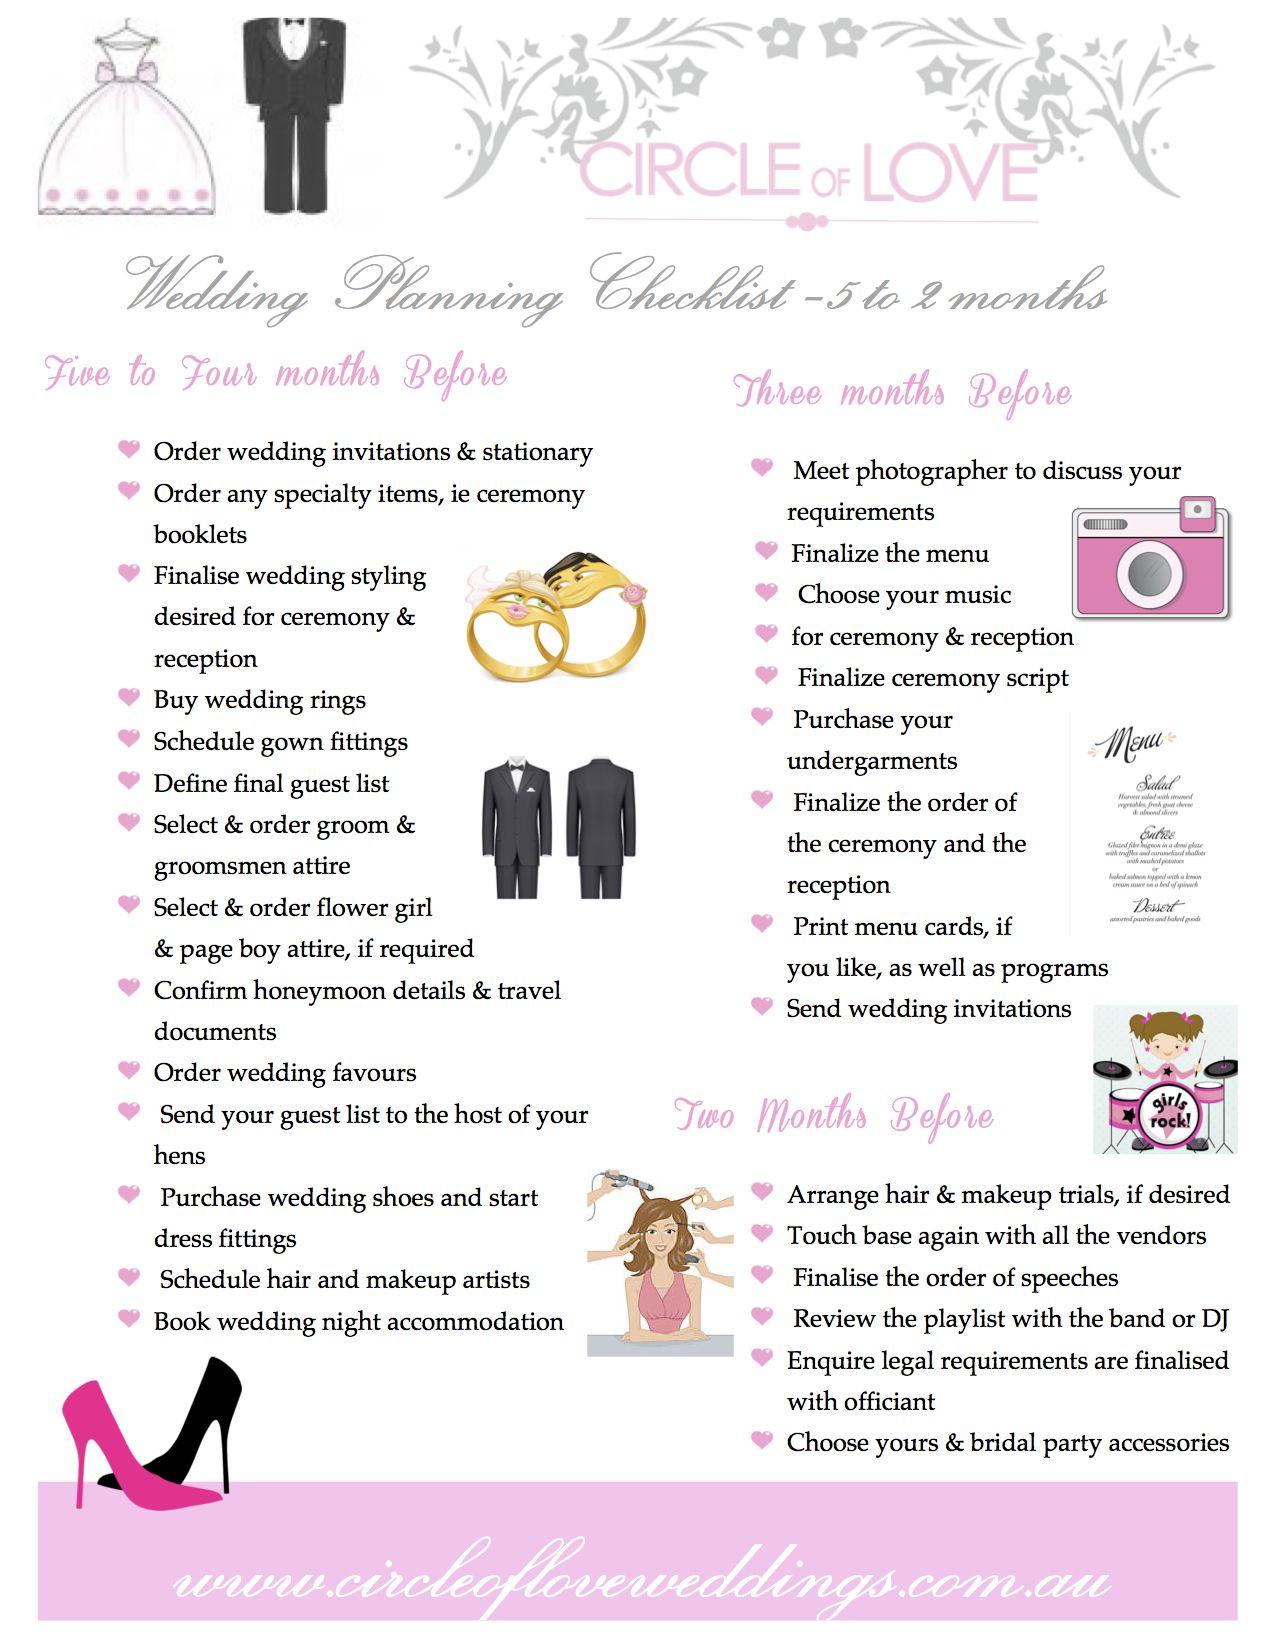 2) Circle of Love Wedding Planning checklist 5 months to 2